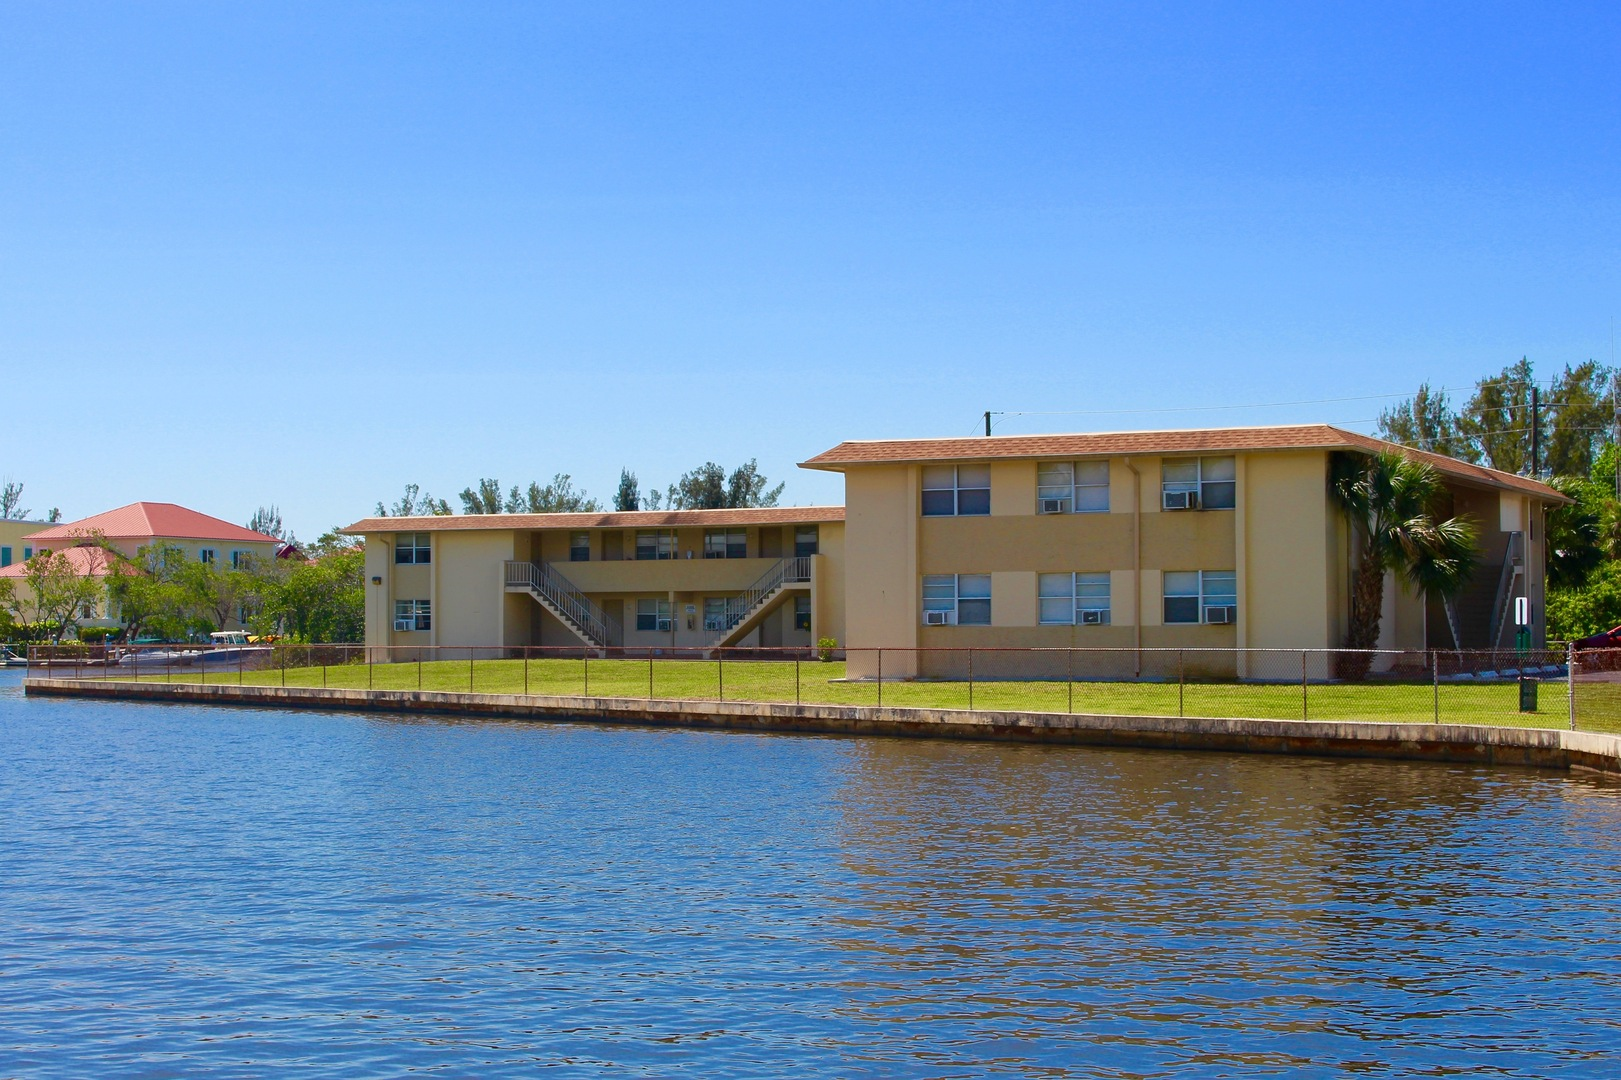 Gordon River Apartment Homes 3 Bedroom 1400 5th Ave N